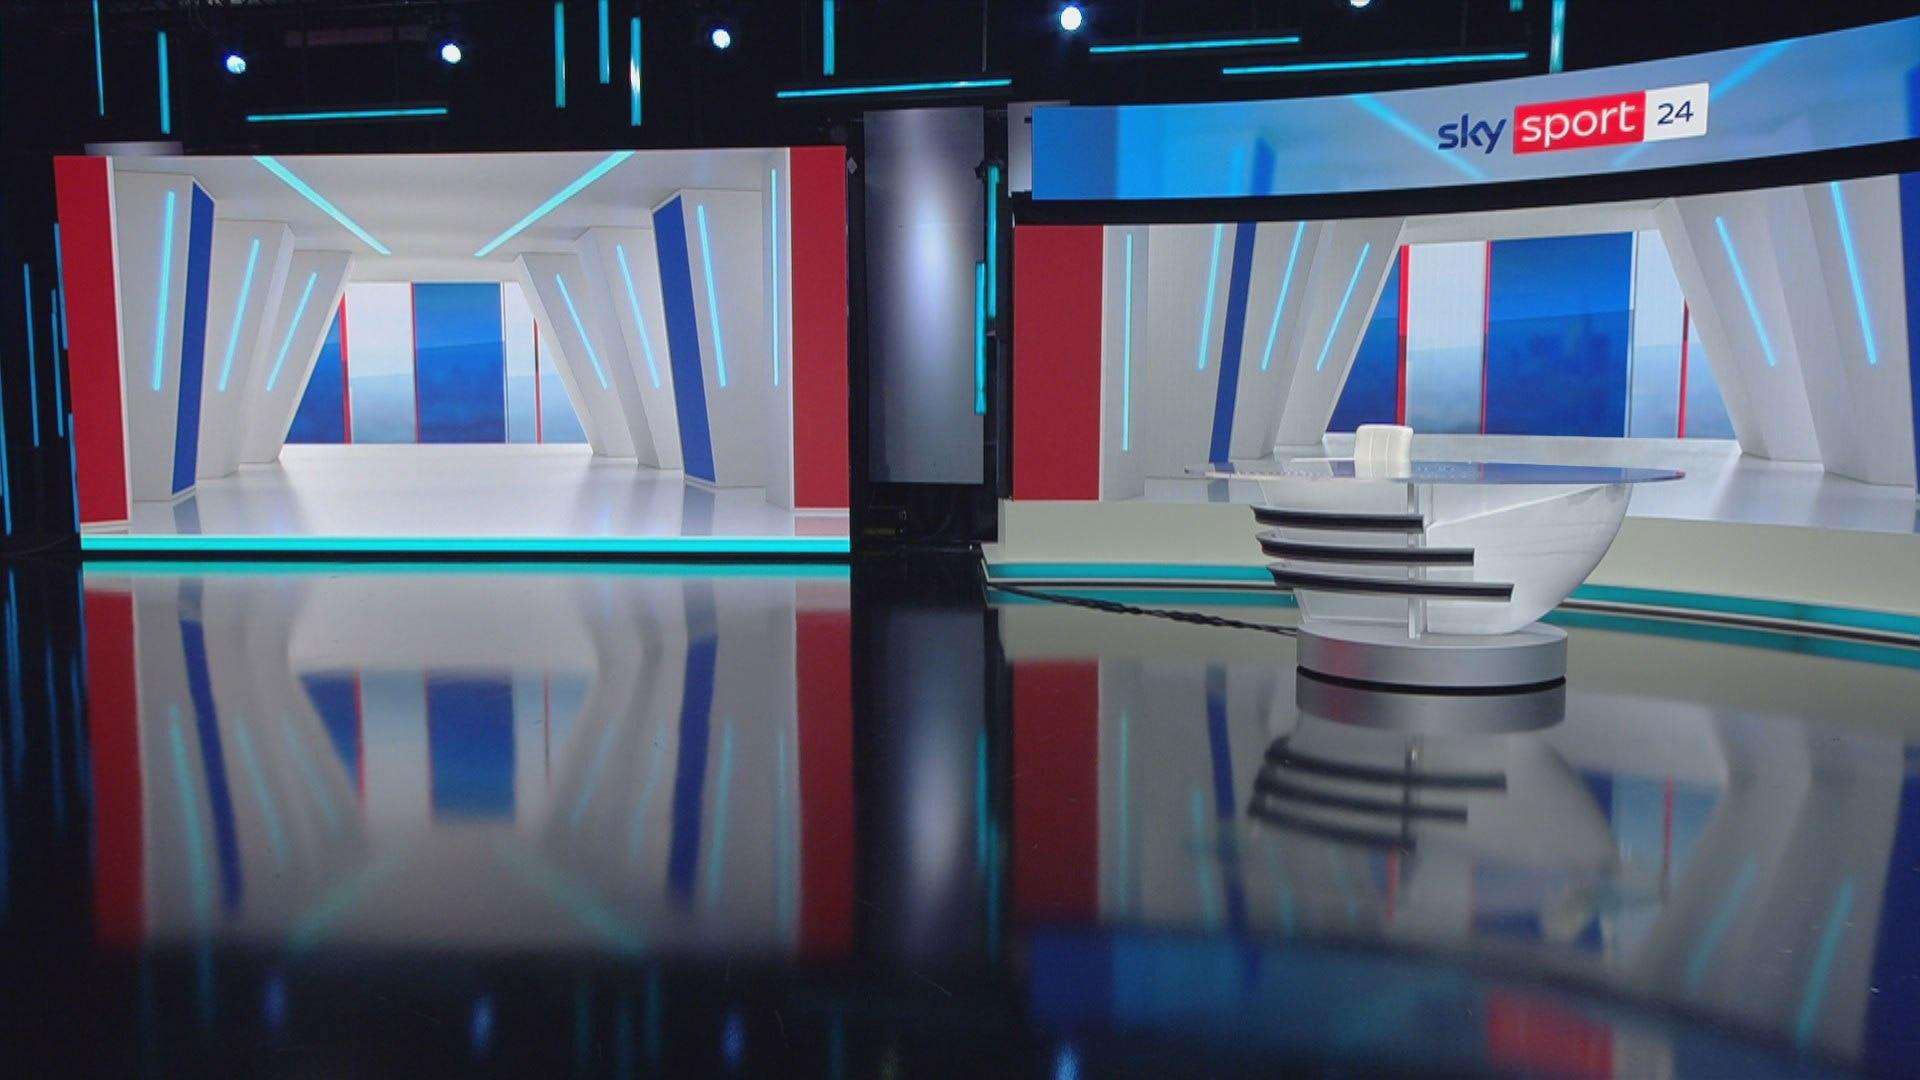 Sky Sport24 Buongiorno Sky Sport 24